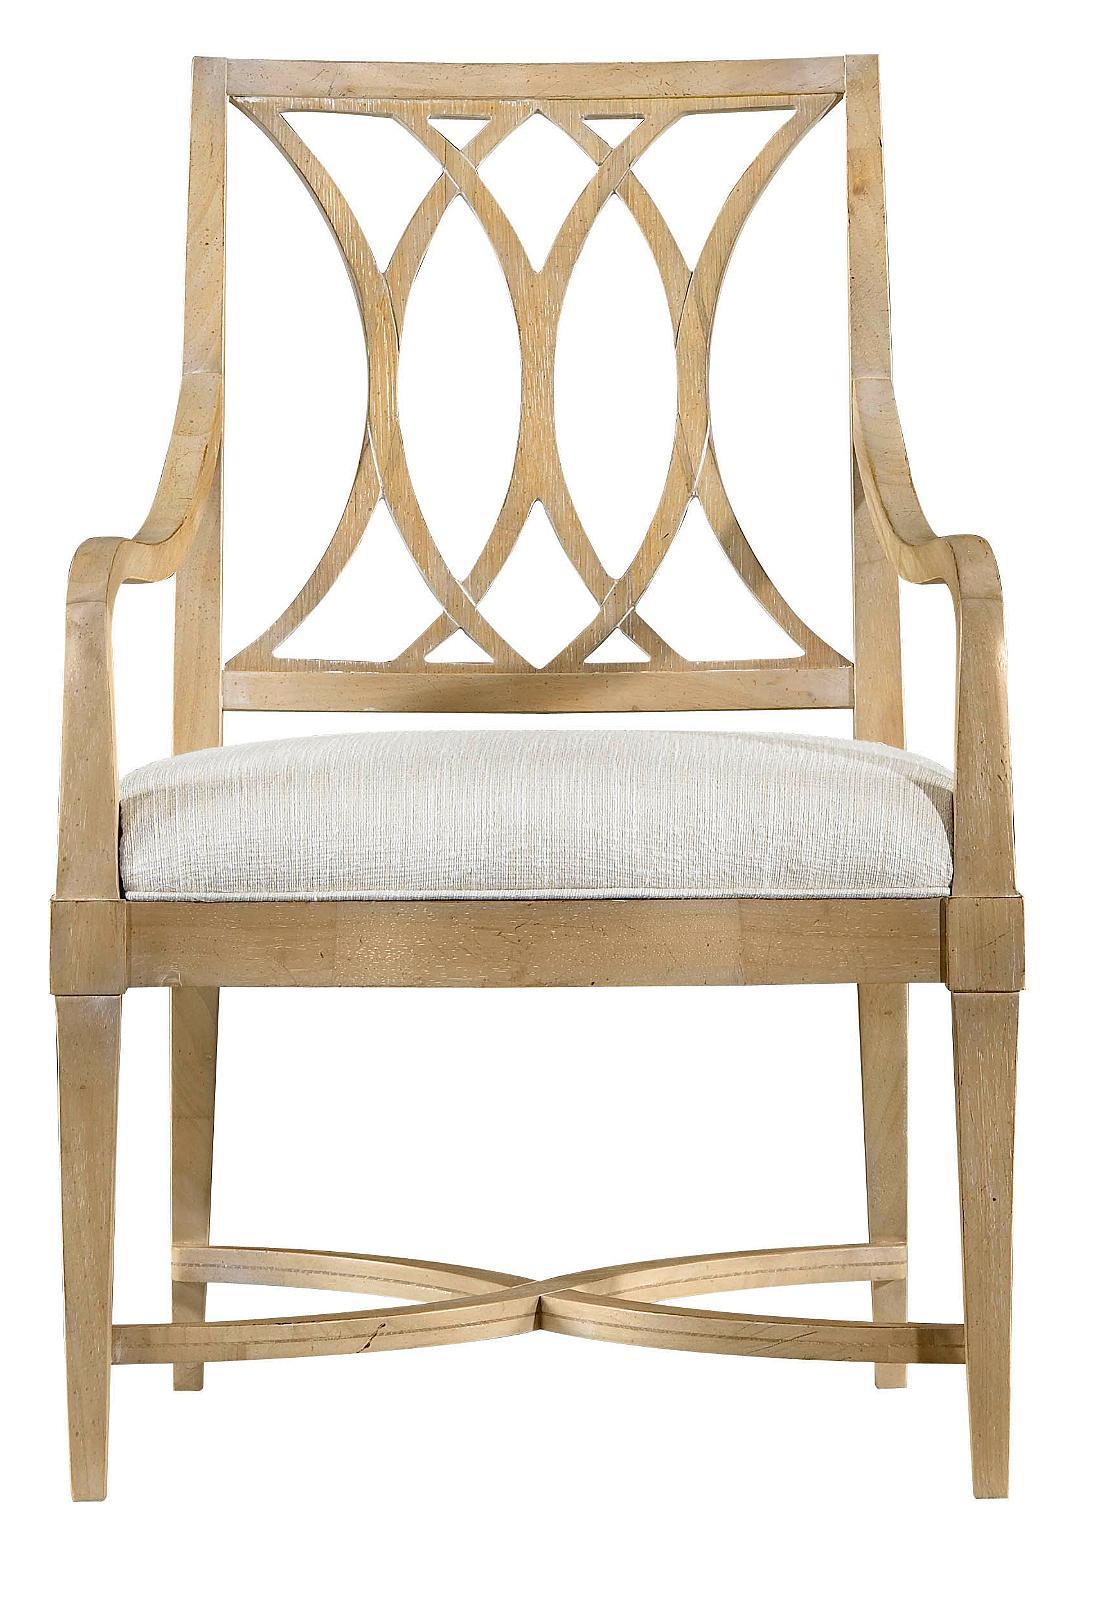 Stanley Furniture Coastal Living Resort Heritage Coast Arm Chair - Item Number: 062-61-70